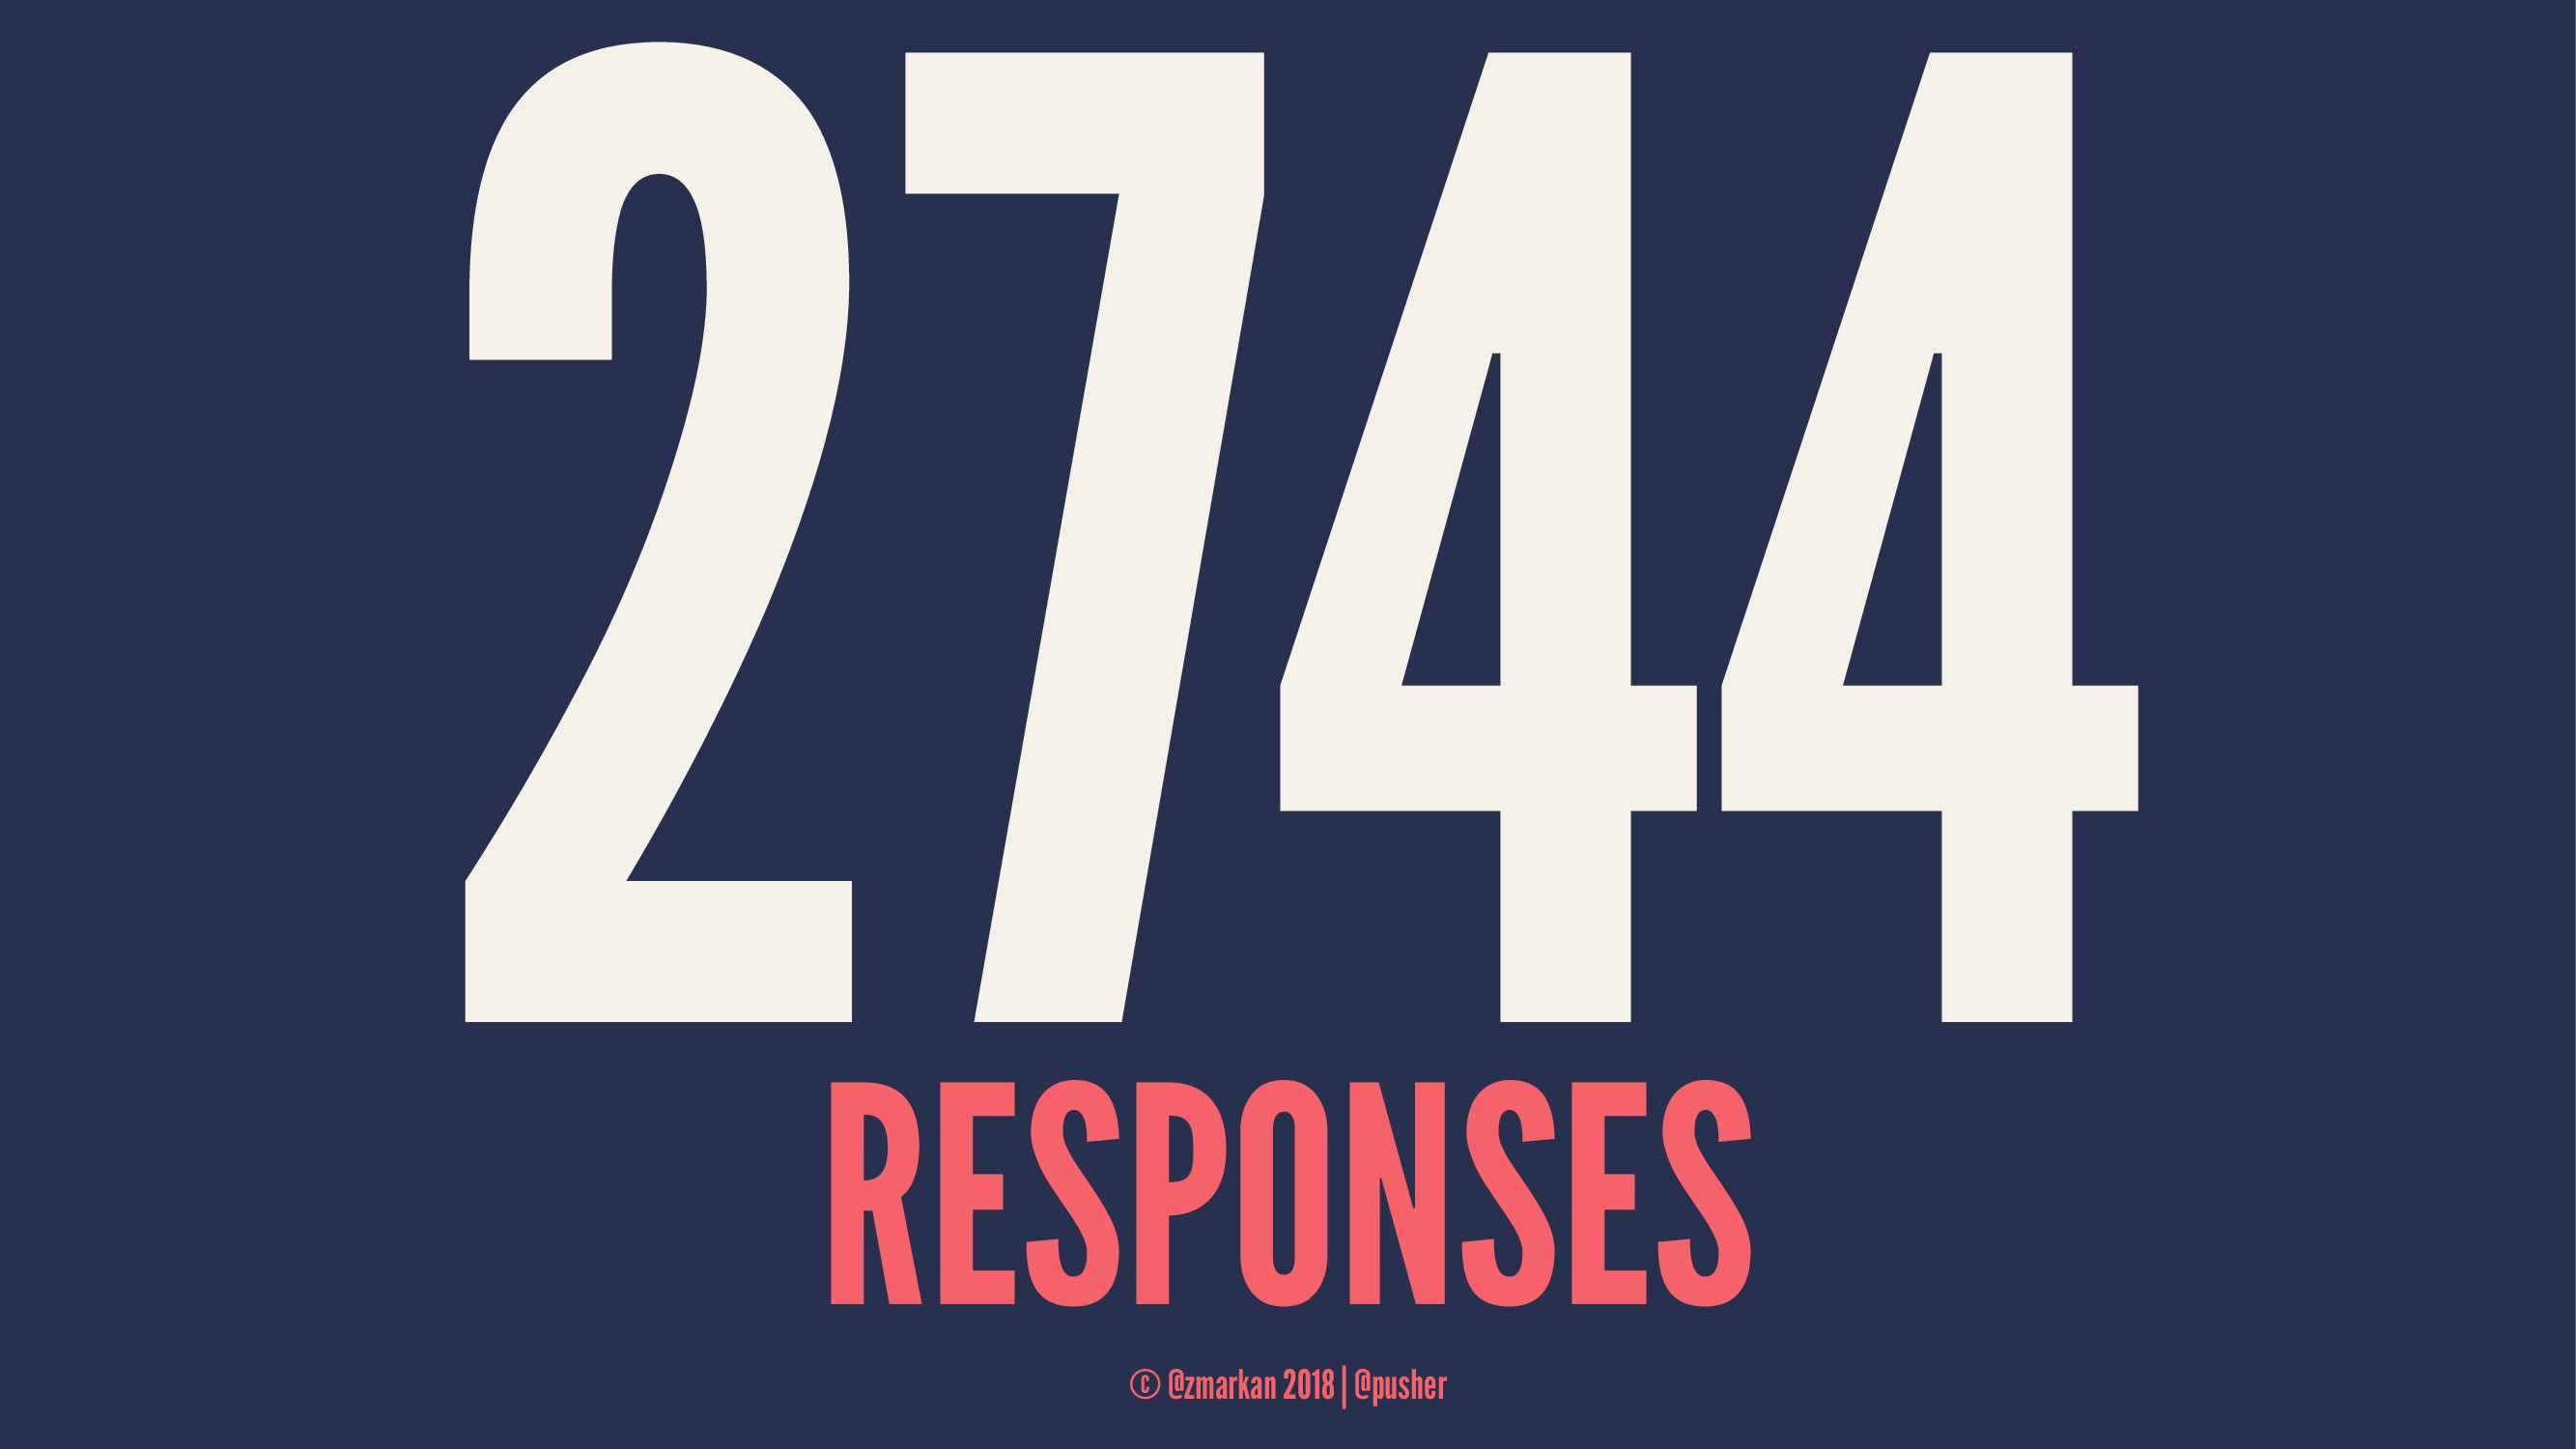 2744 RESPONSES © @zmarkan 2018 | @pusher